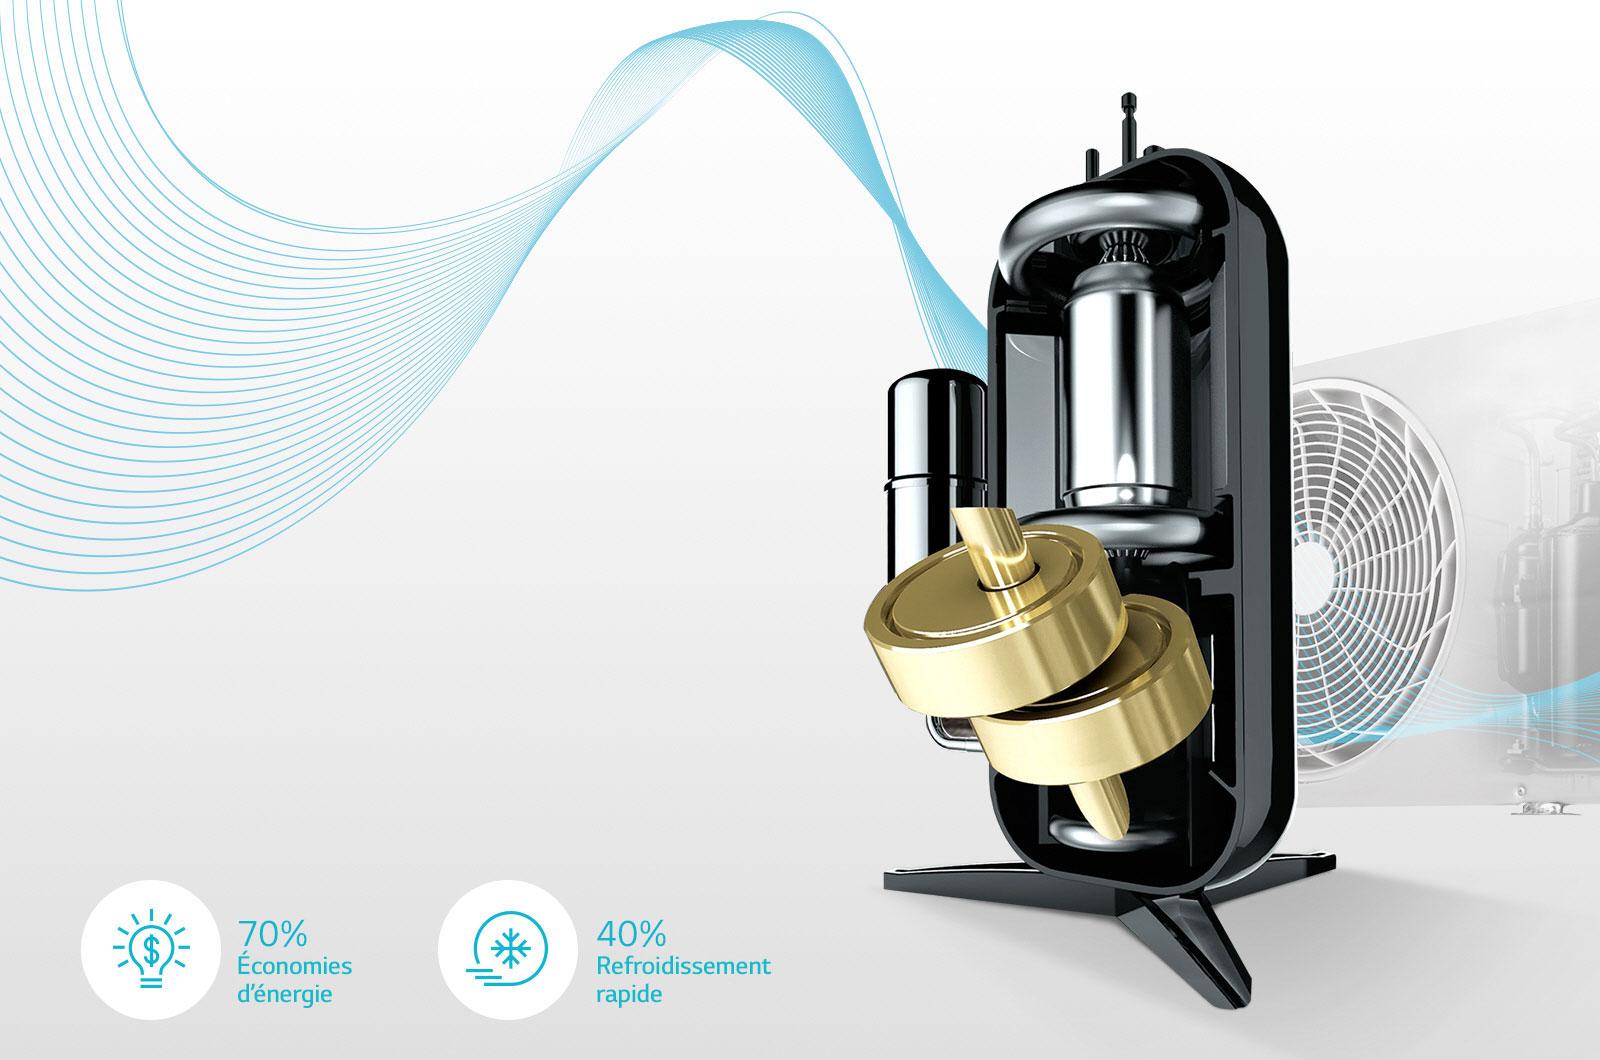 DUAL Inverter Compressor™ Garantie 10 Ans1